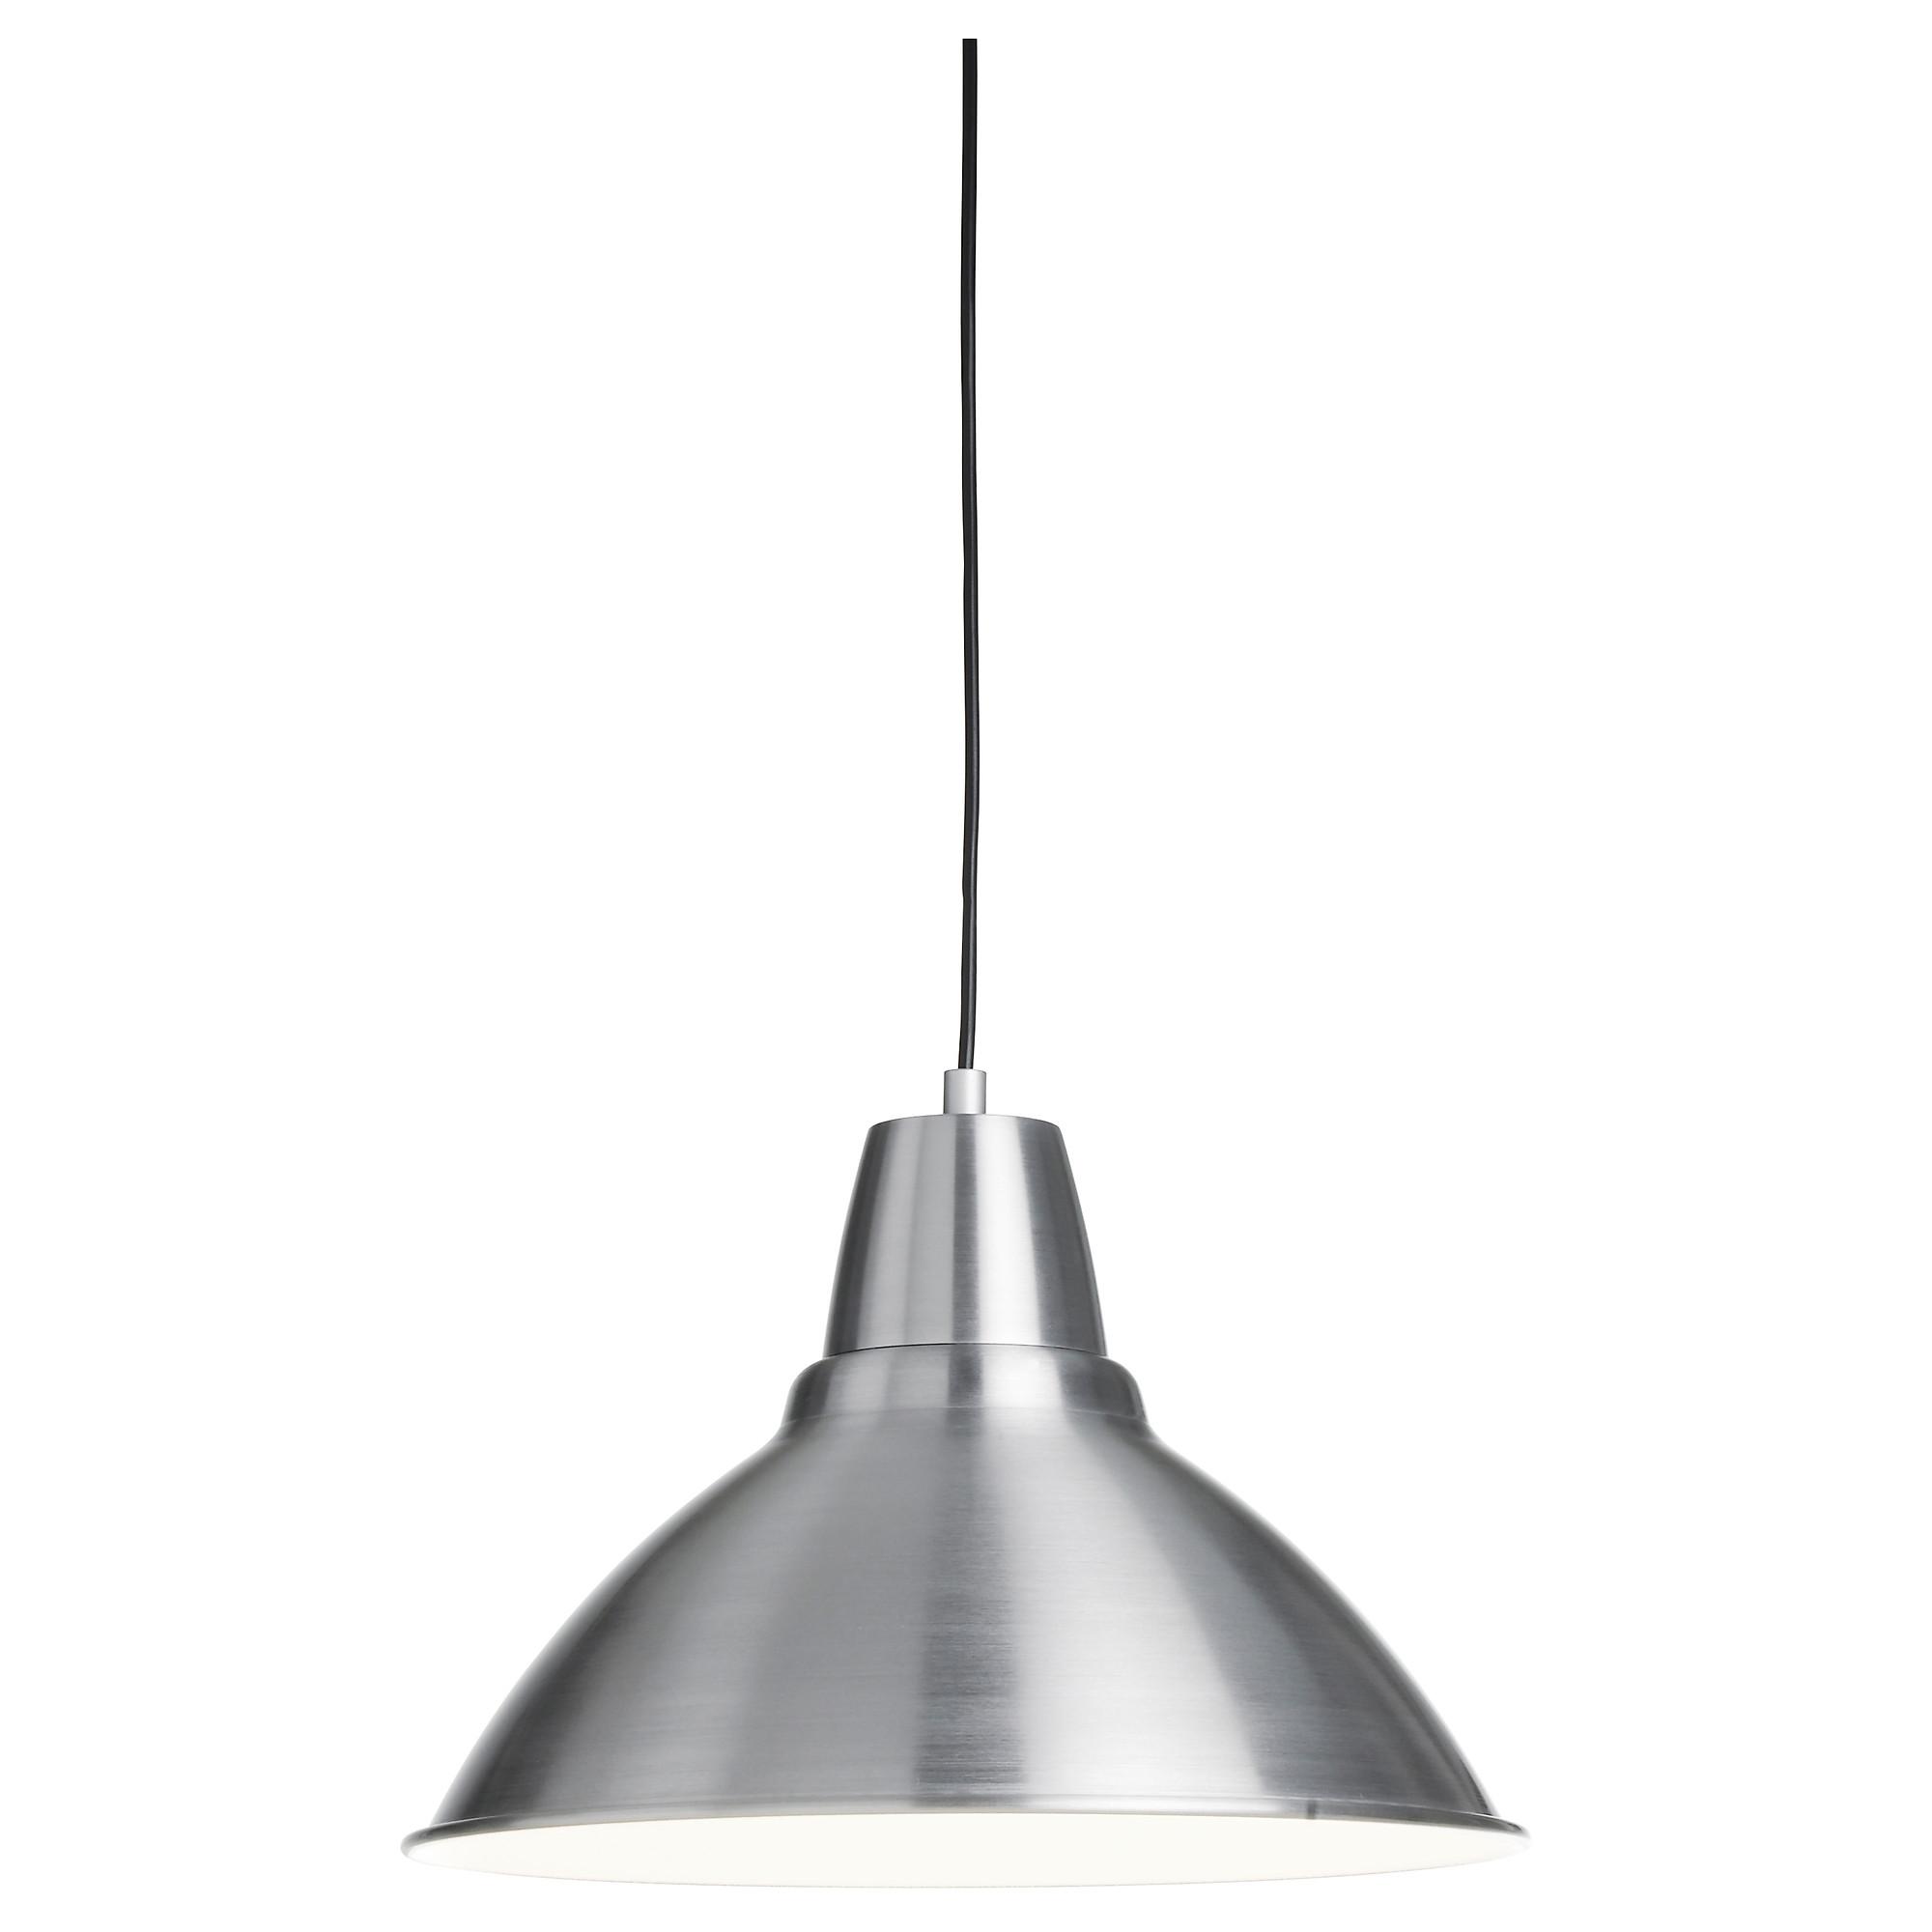 ceiling lamp foto pendant lamp with led bulb, aluminum max.: 75 w diameter: 15 NXKXSCM